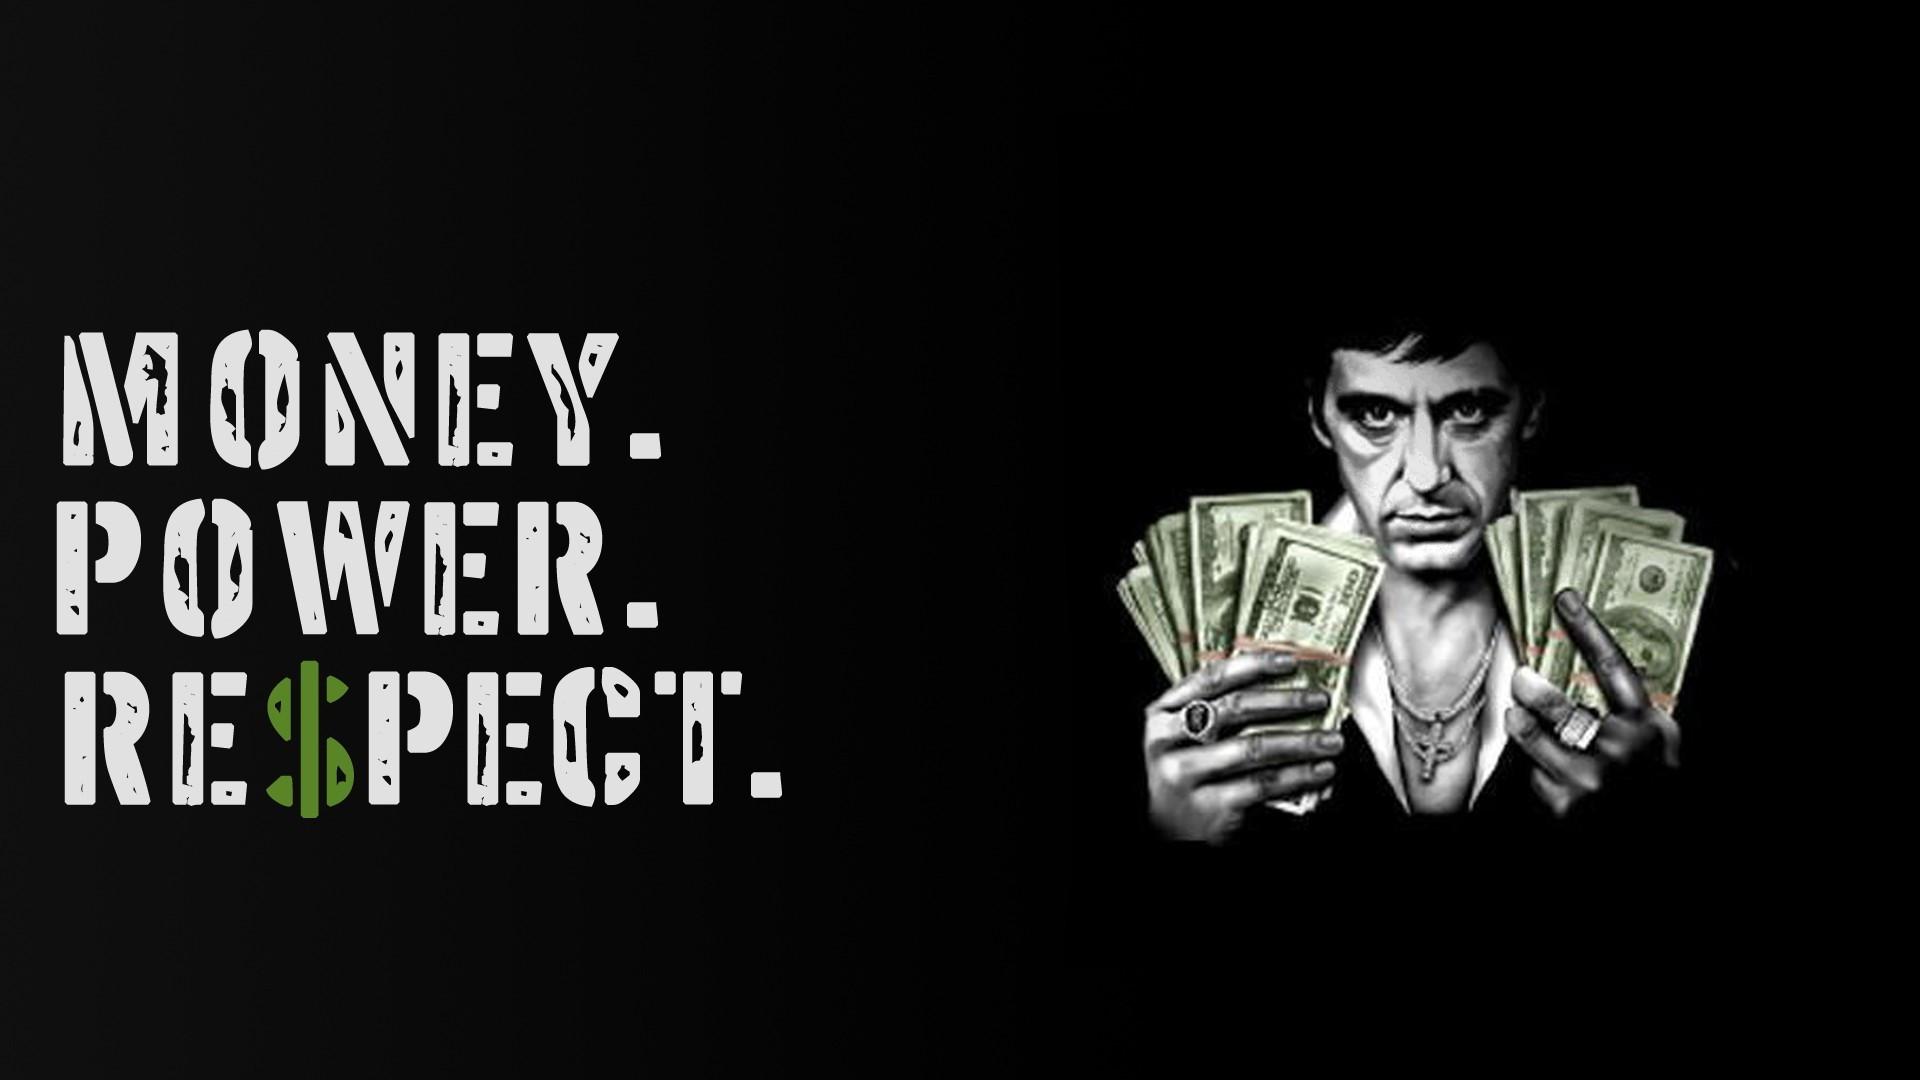 Gangster ...